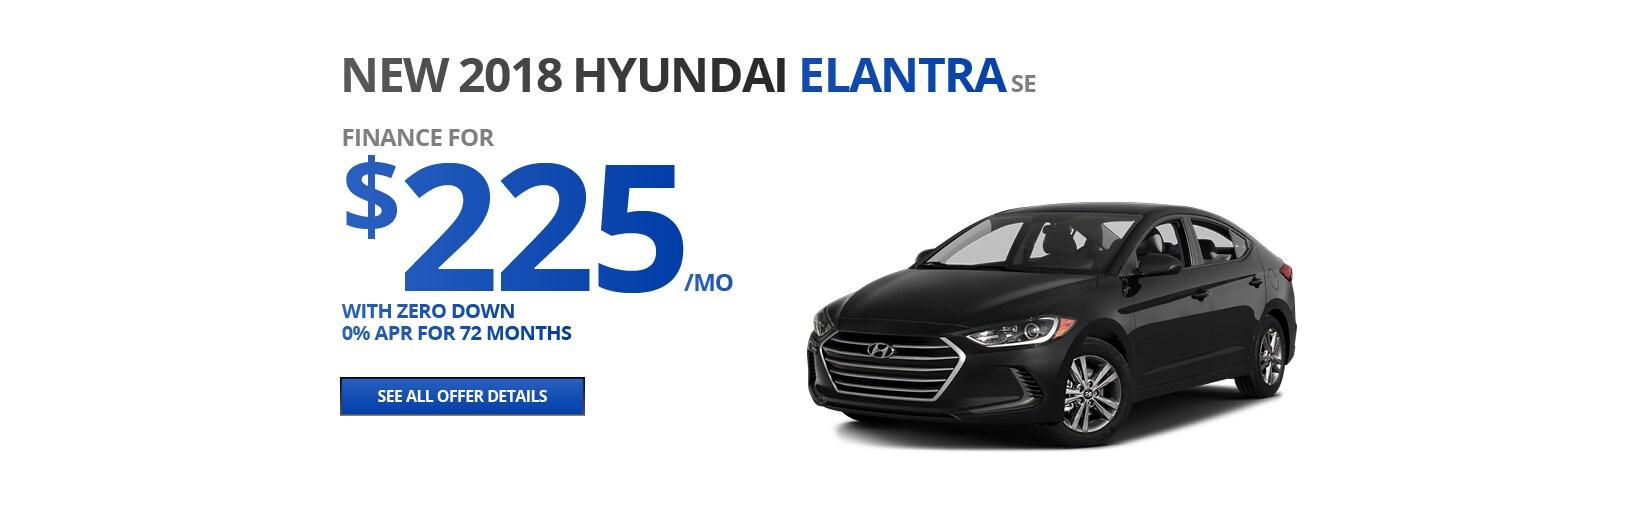 Car Dealerships Springfield Ma >> New & Used Hyundai Dealer Serving Springfield, MA.